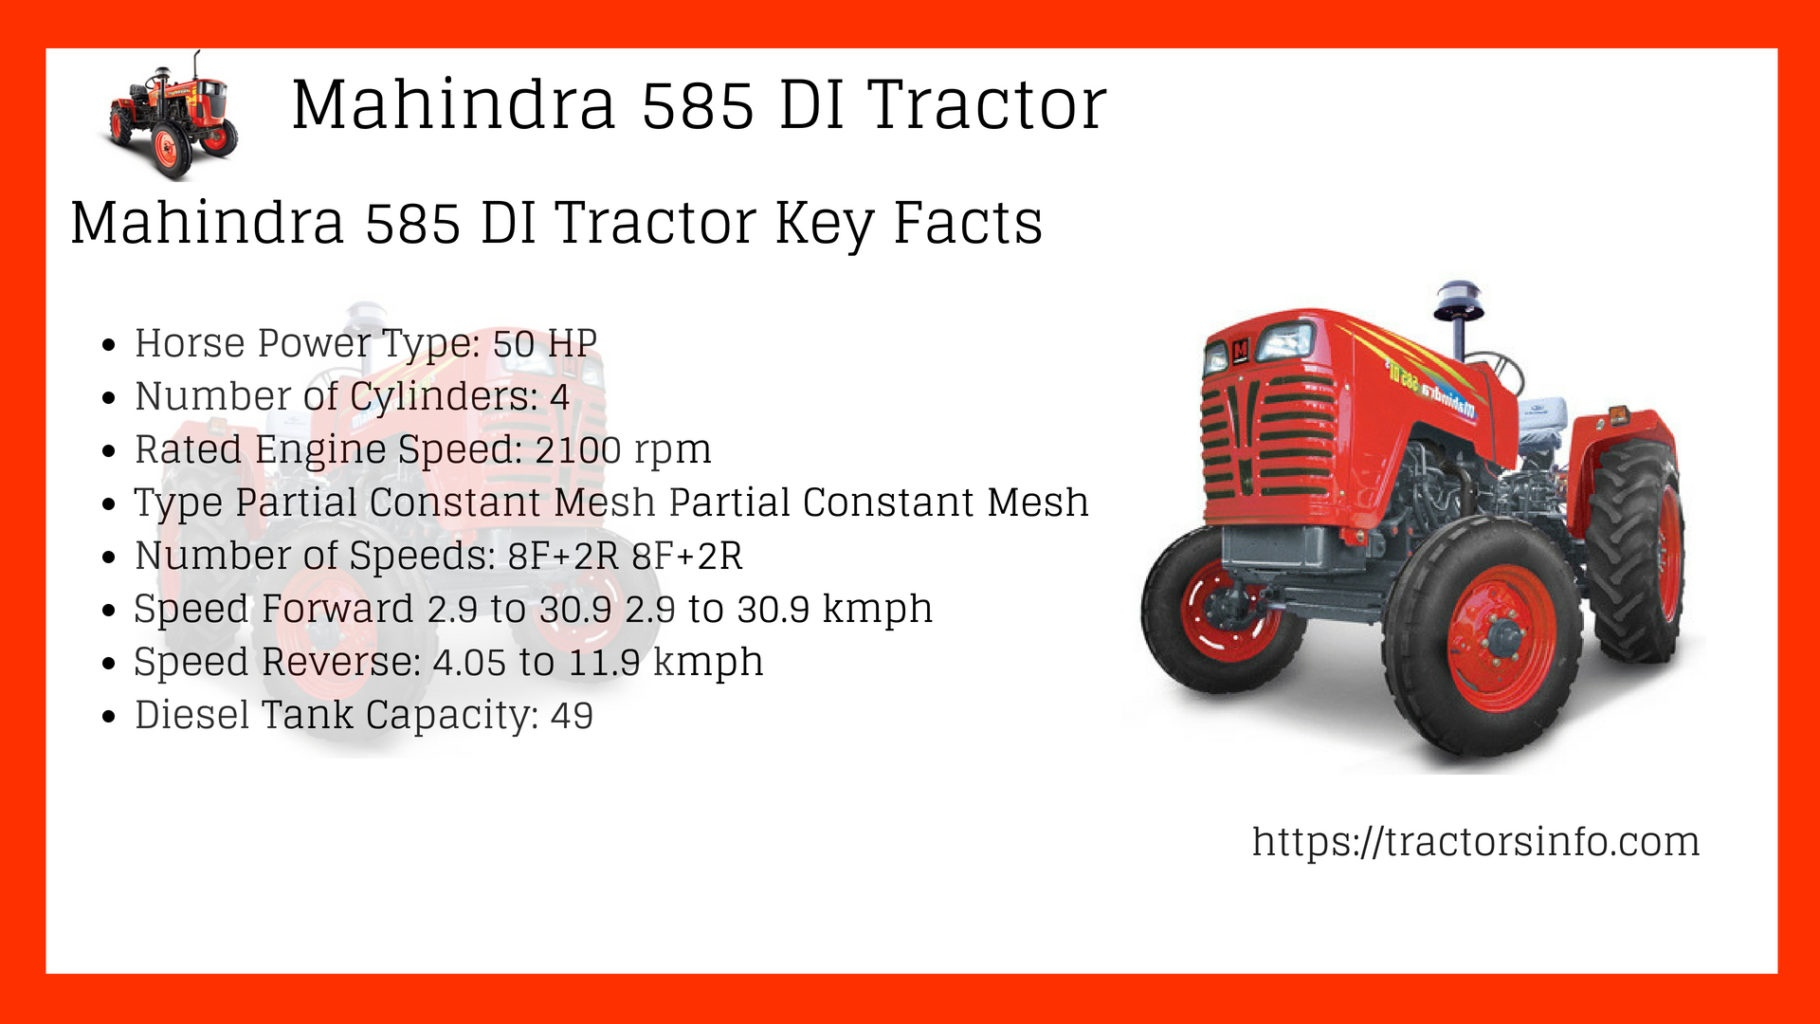 Mahindra-585-DI-Tractor